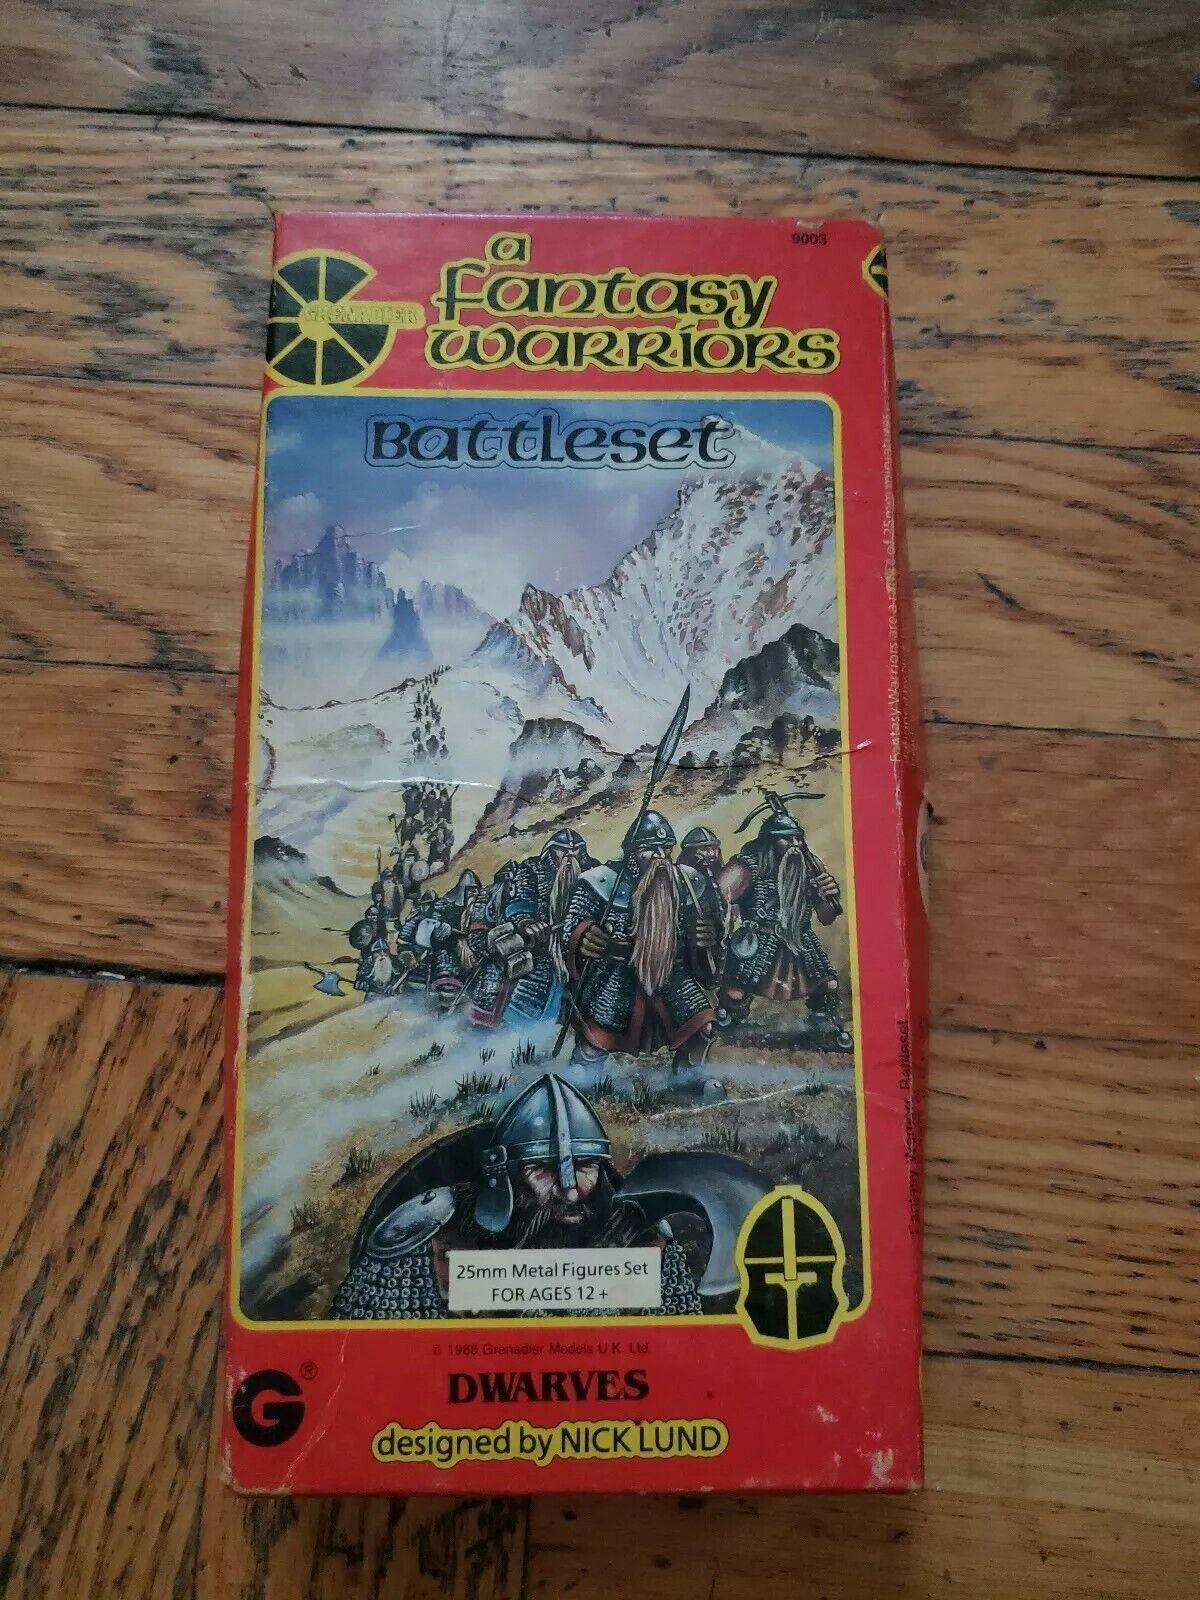 903 Nick Lund A fantasyc Warriors 25mm Metal cifras Battleset Dwarves 10 of 12